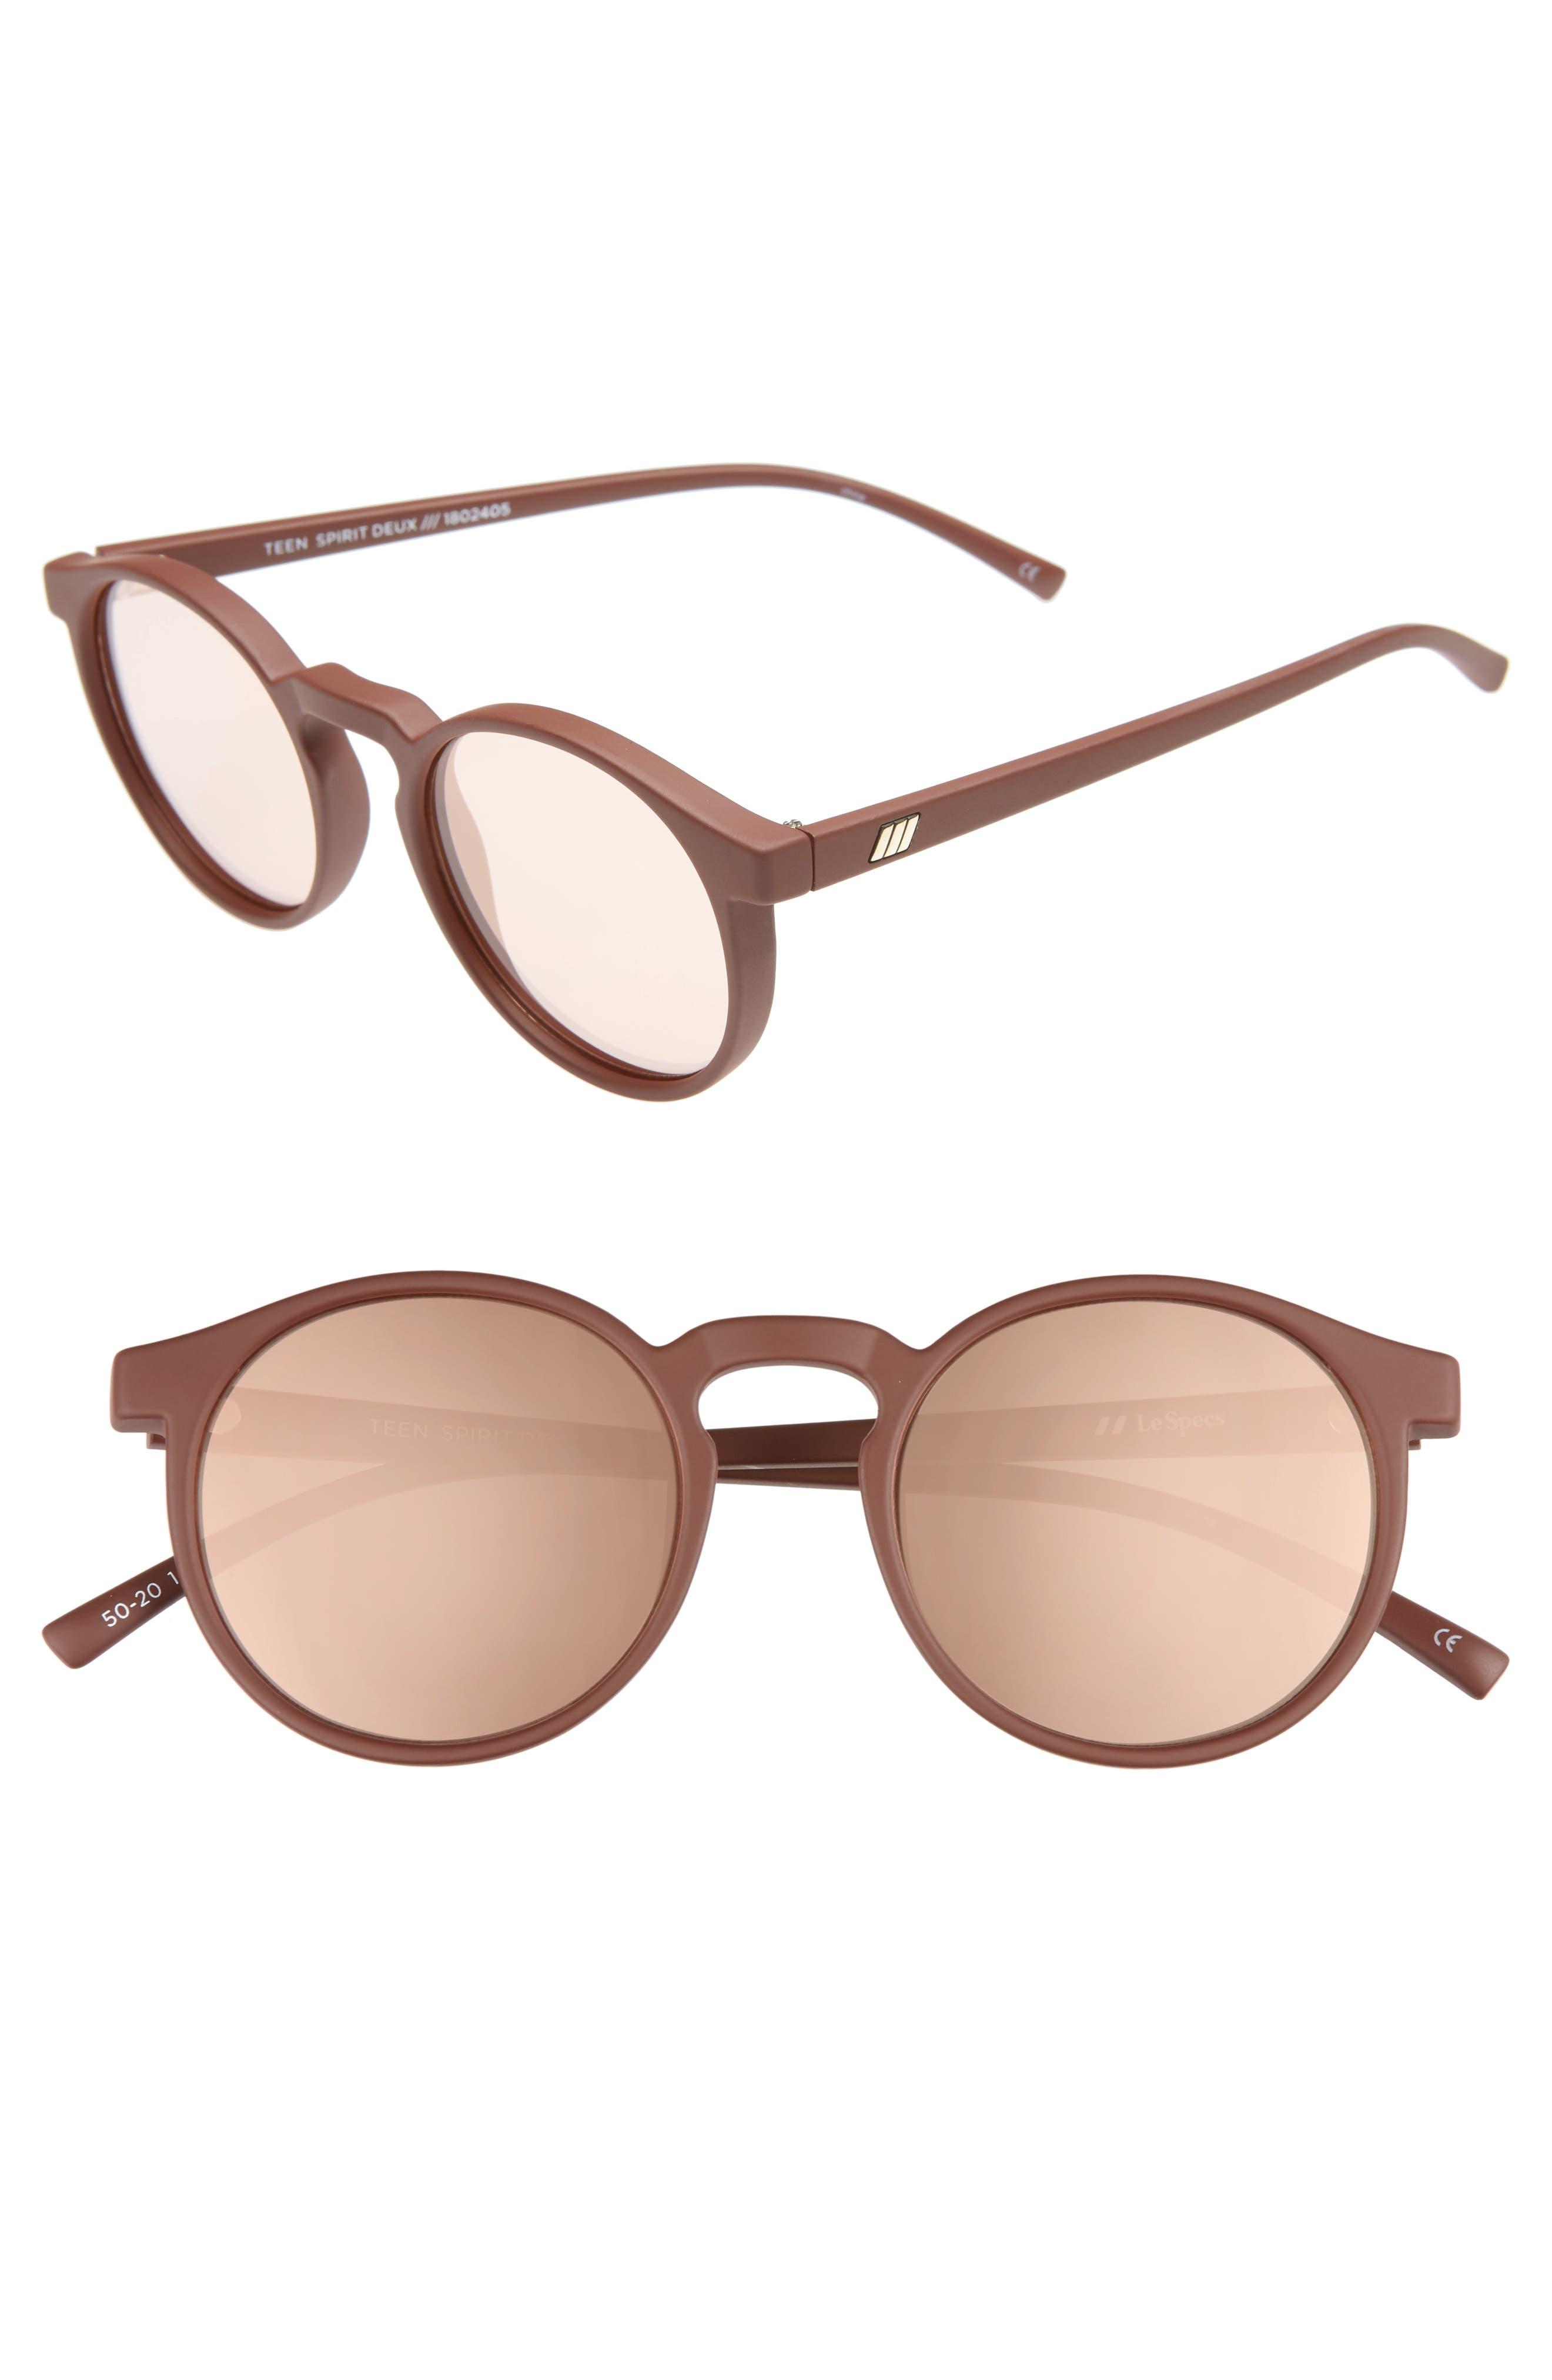 1940s Sunglasses, Glasses & Eyeglasses History Womens Le Specs Teen Spirit Deaux 50Mm Round Sunglasses - Matte Shiraz $59.00 AT vintagedancer.com